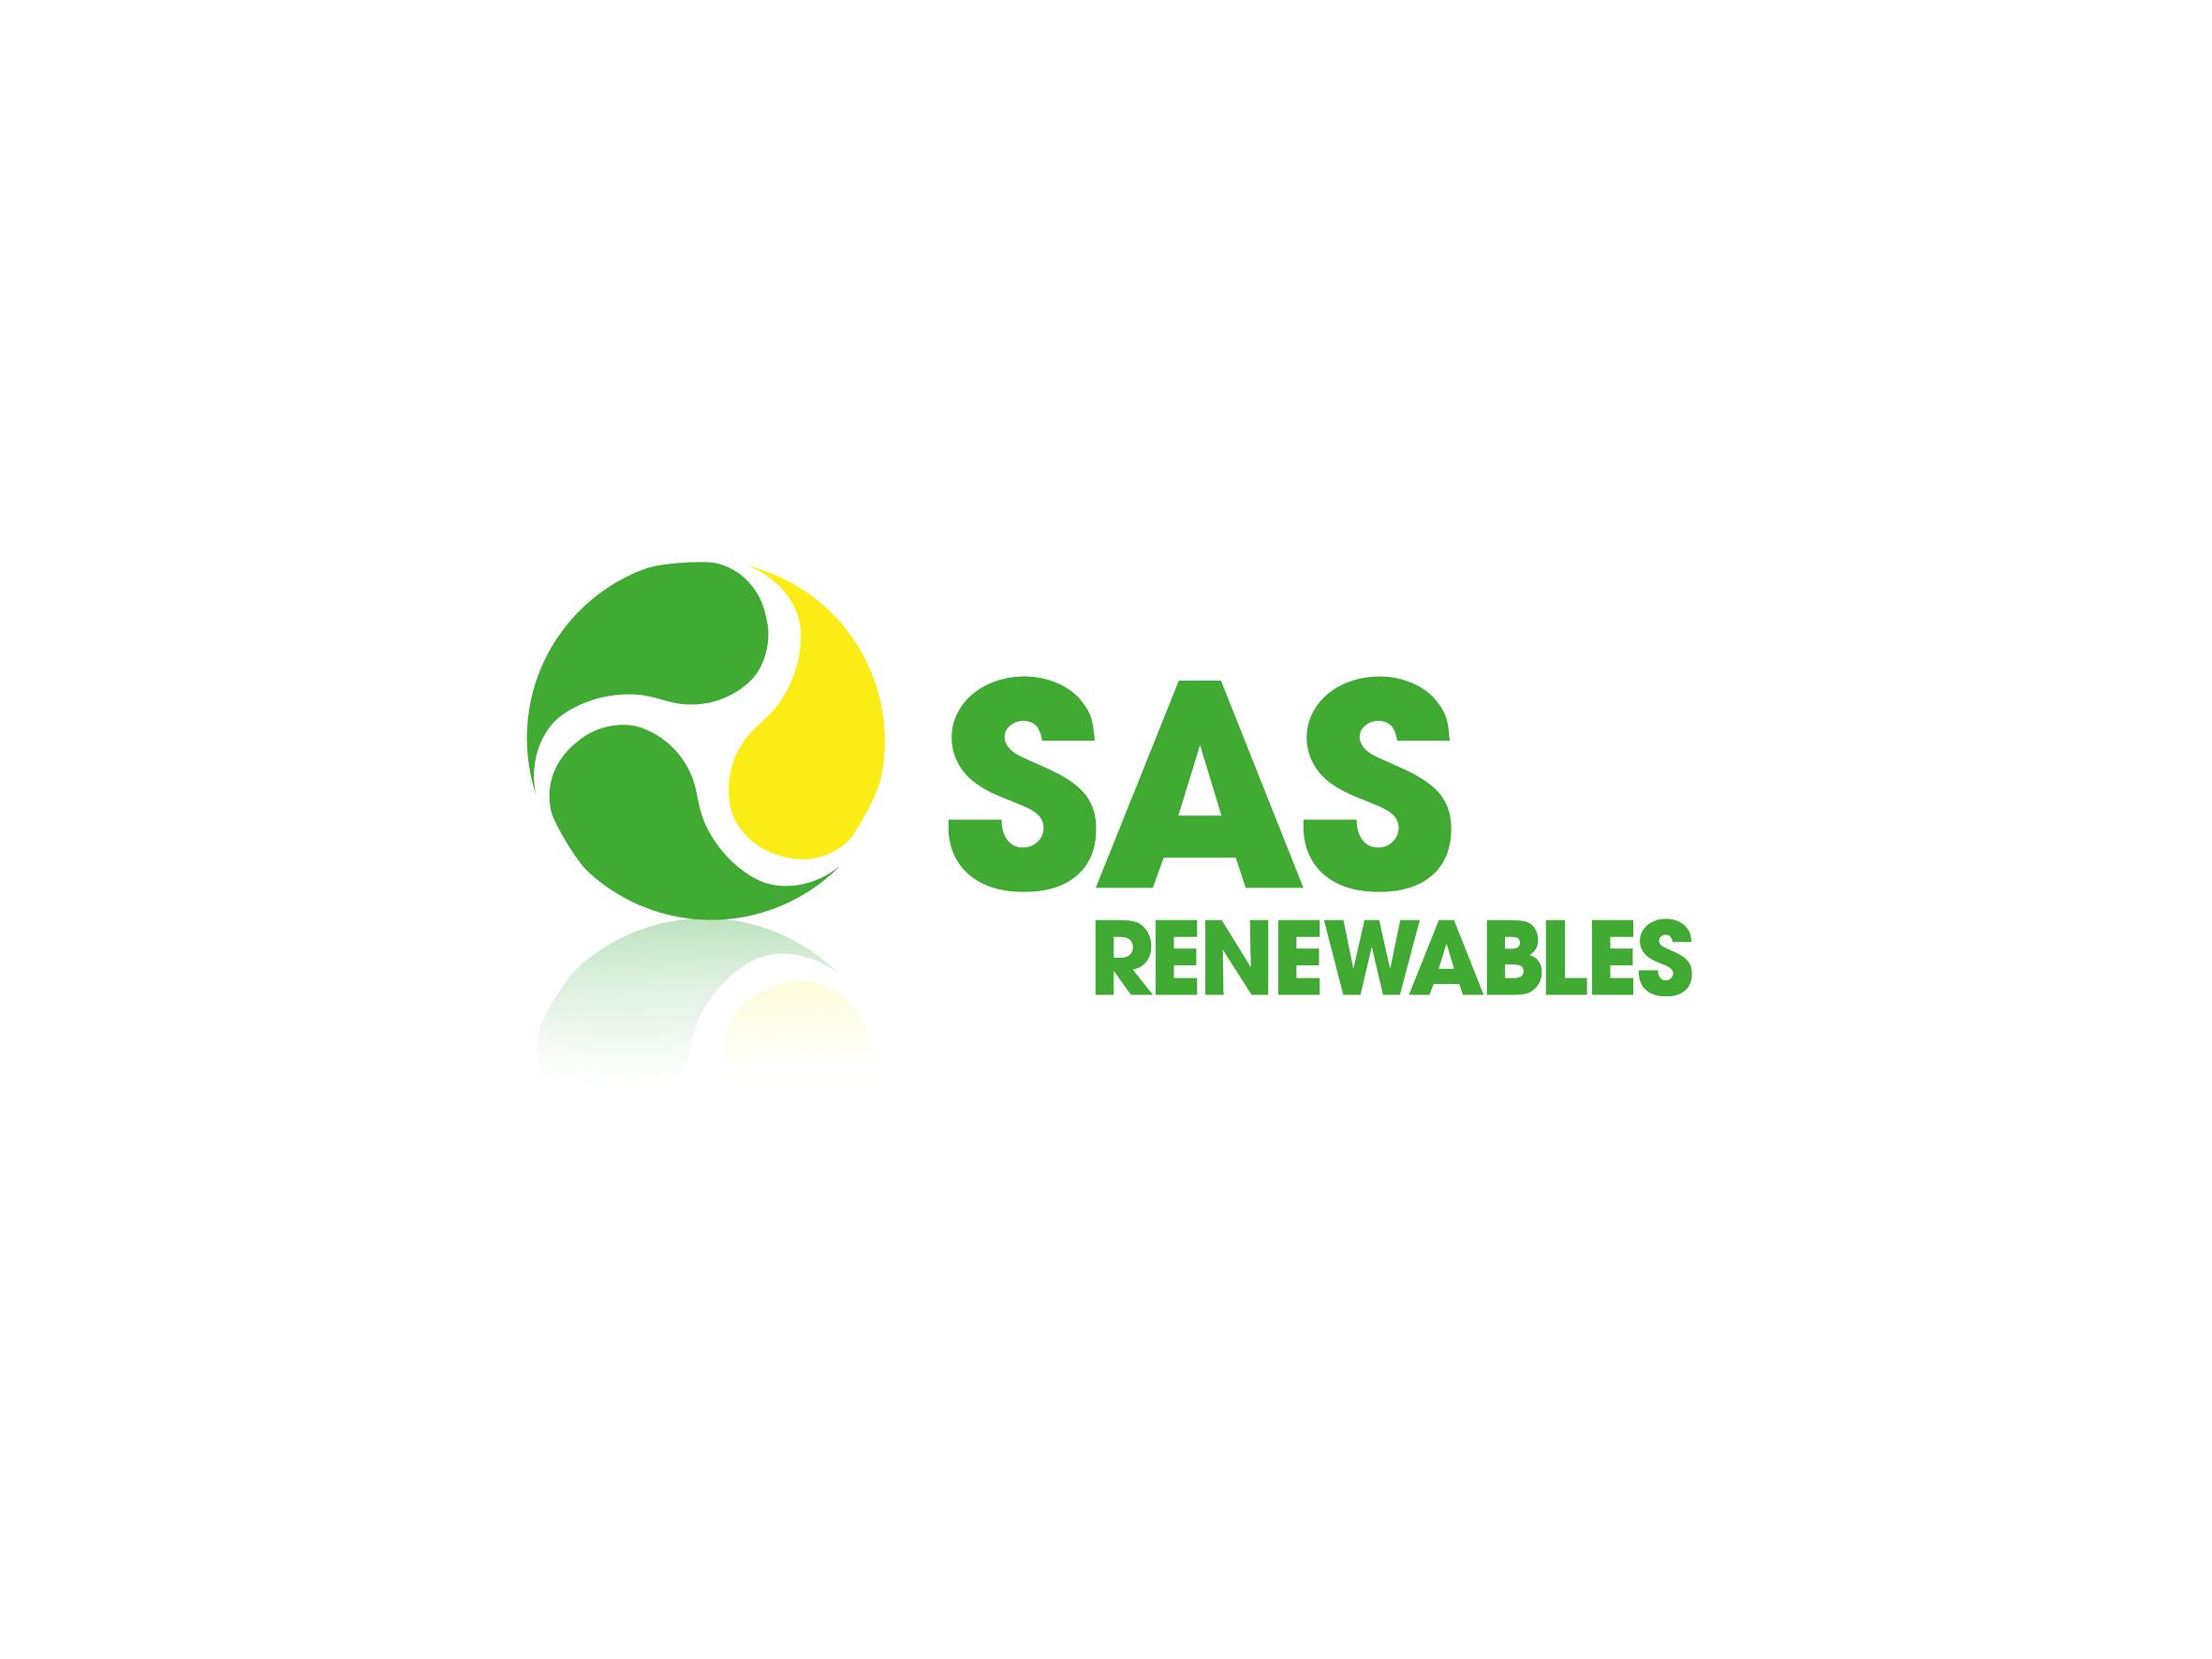 sas renewables logo design designed by Dakini Design Saltaire, Shipley, Bradford